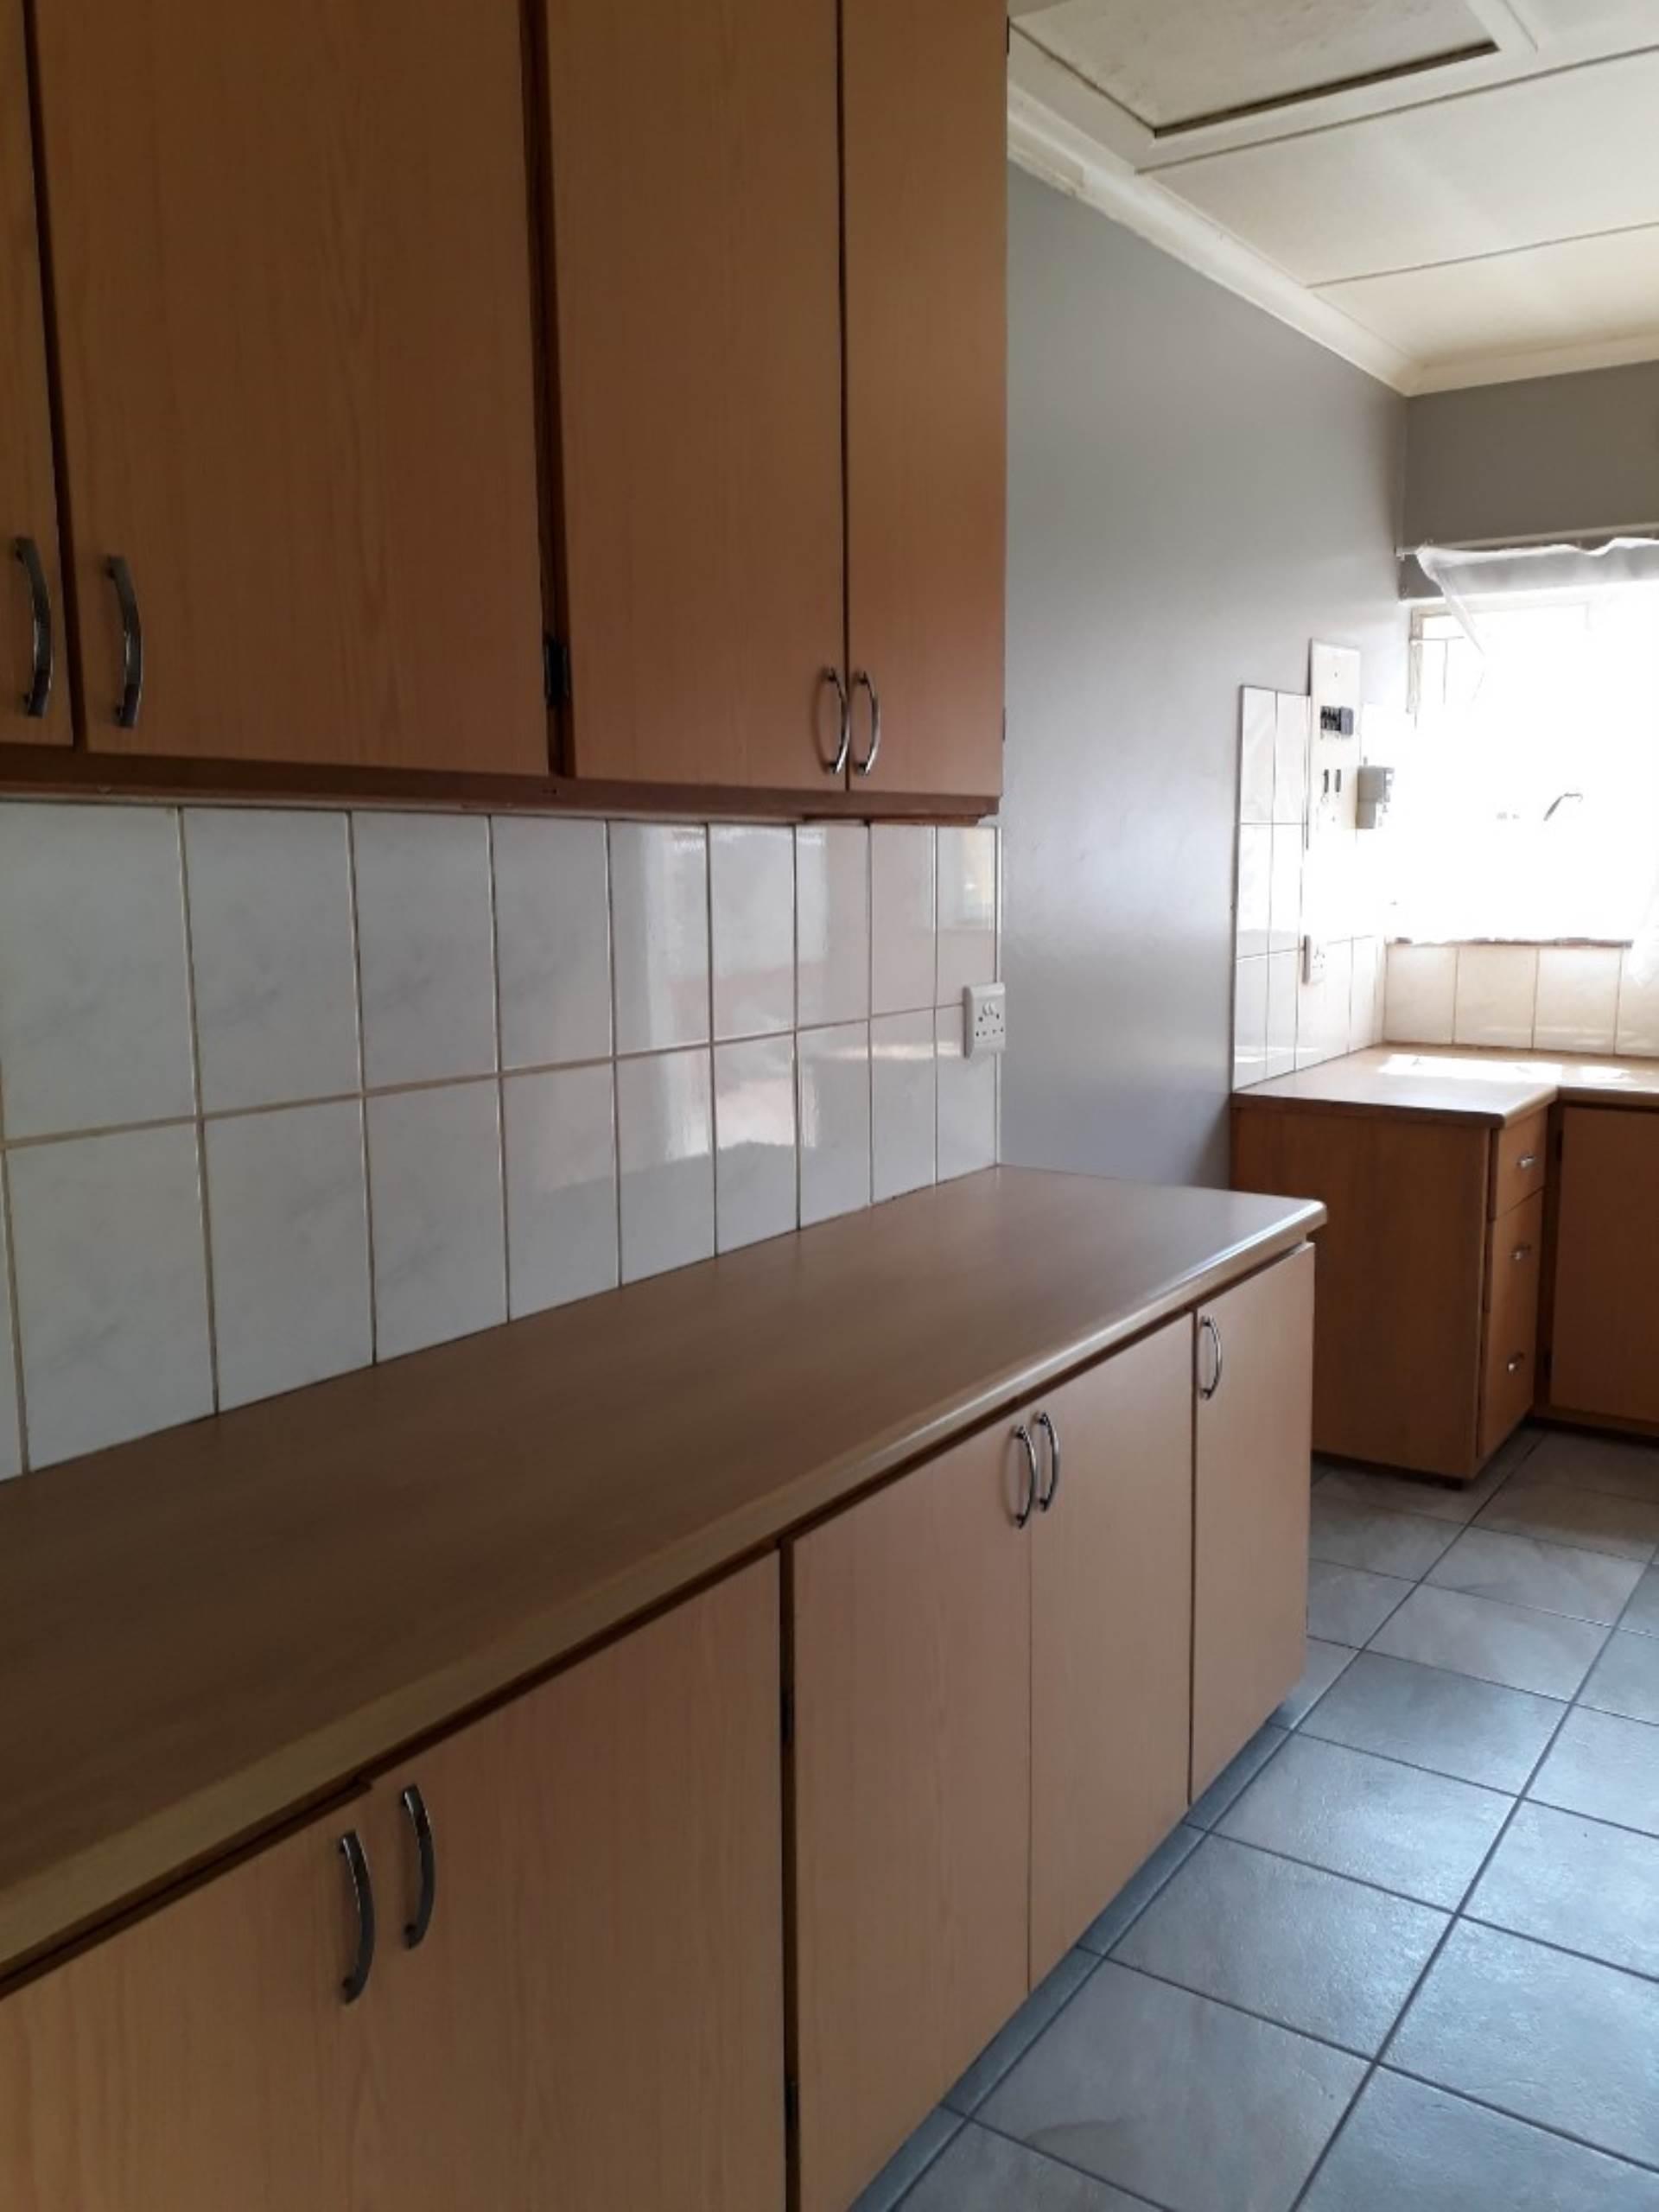 3 BedroomHouse To Rent In Sasolburg